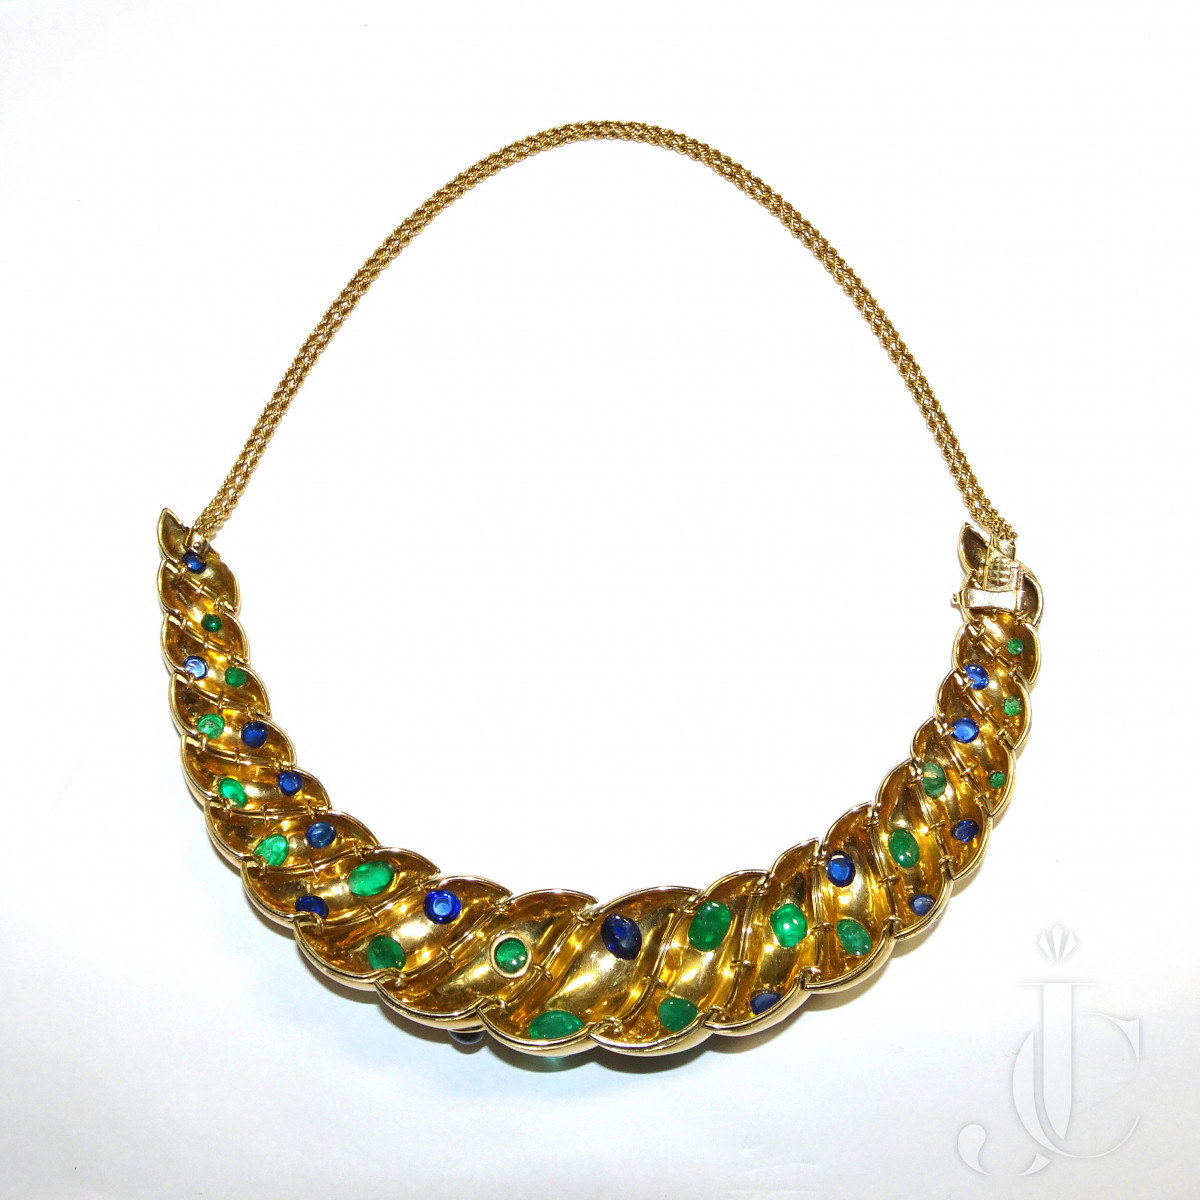 Boivin Gold Collier